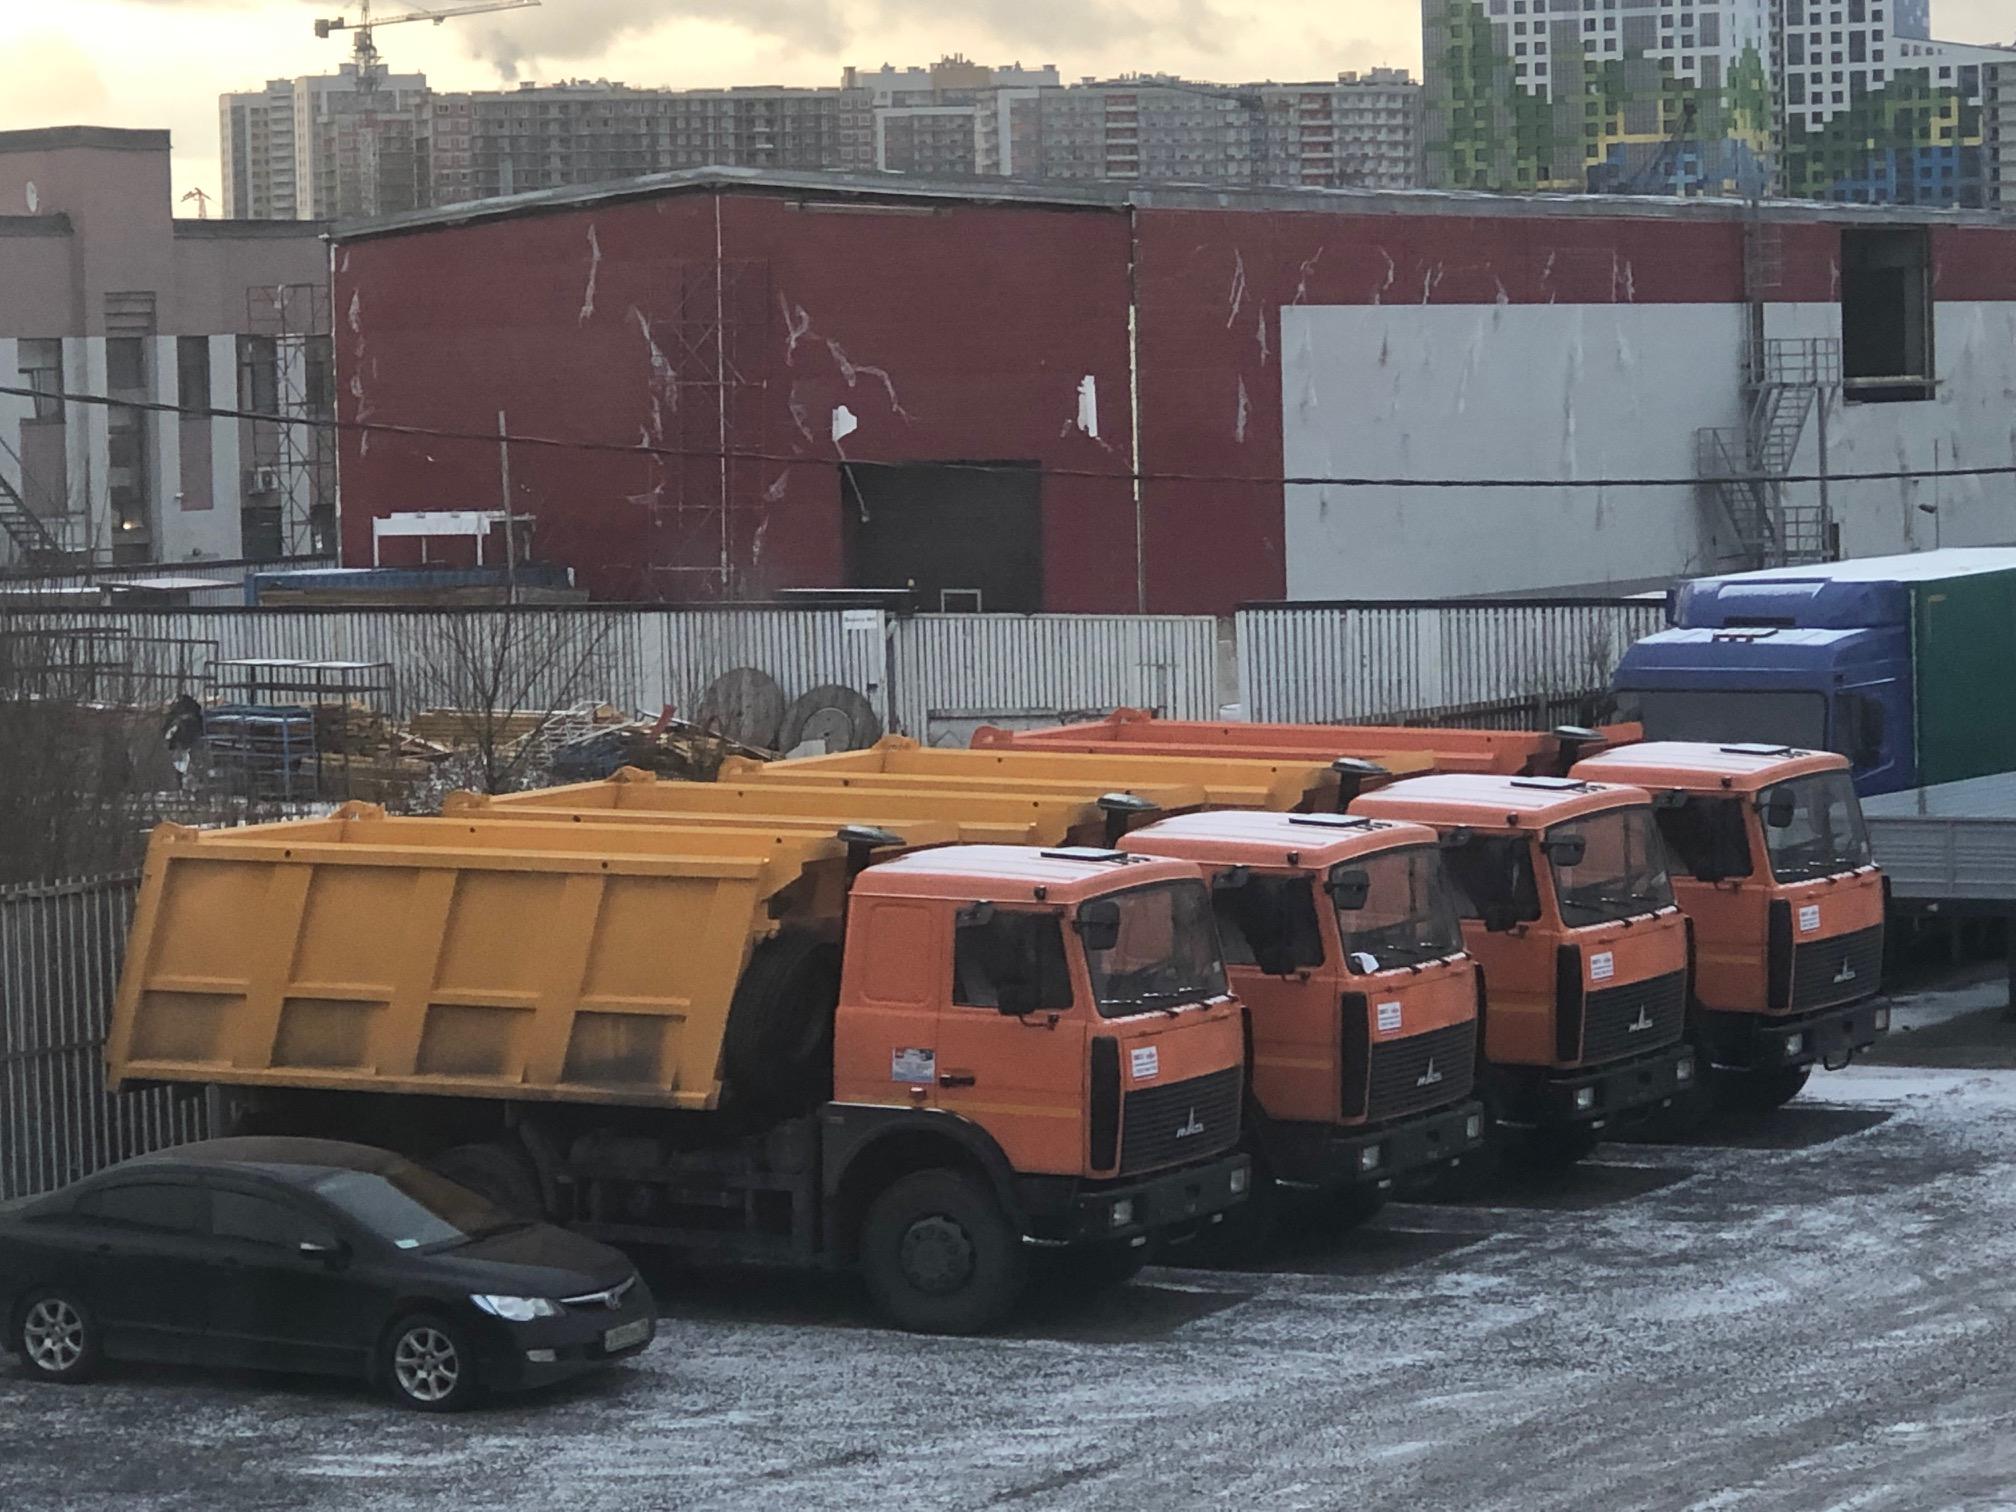 Продажа МАЗ 5516Х5 самосвал 15,6 куб 6х4 20 т 2018 г. НОВЫЙ наличие